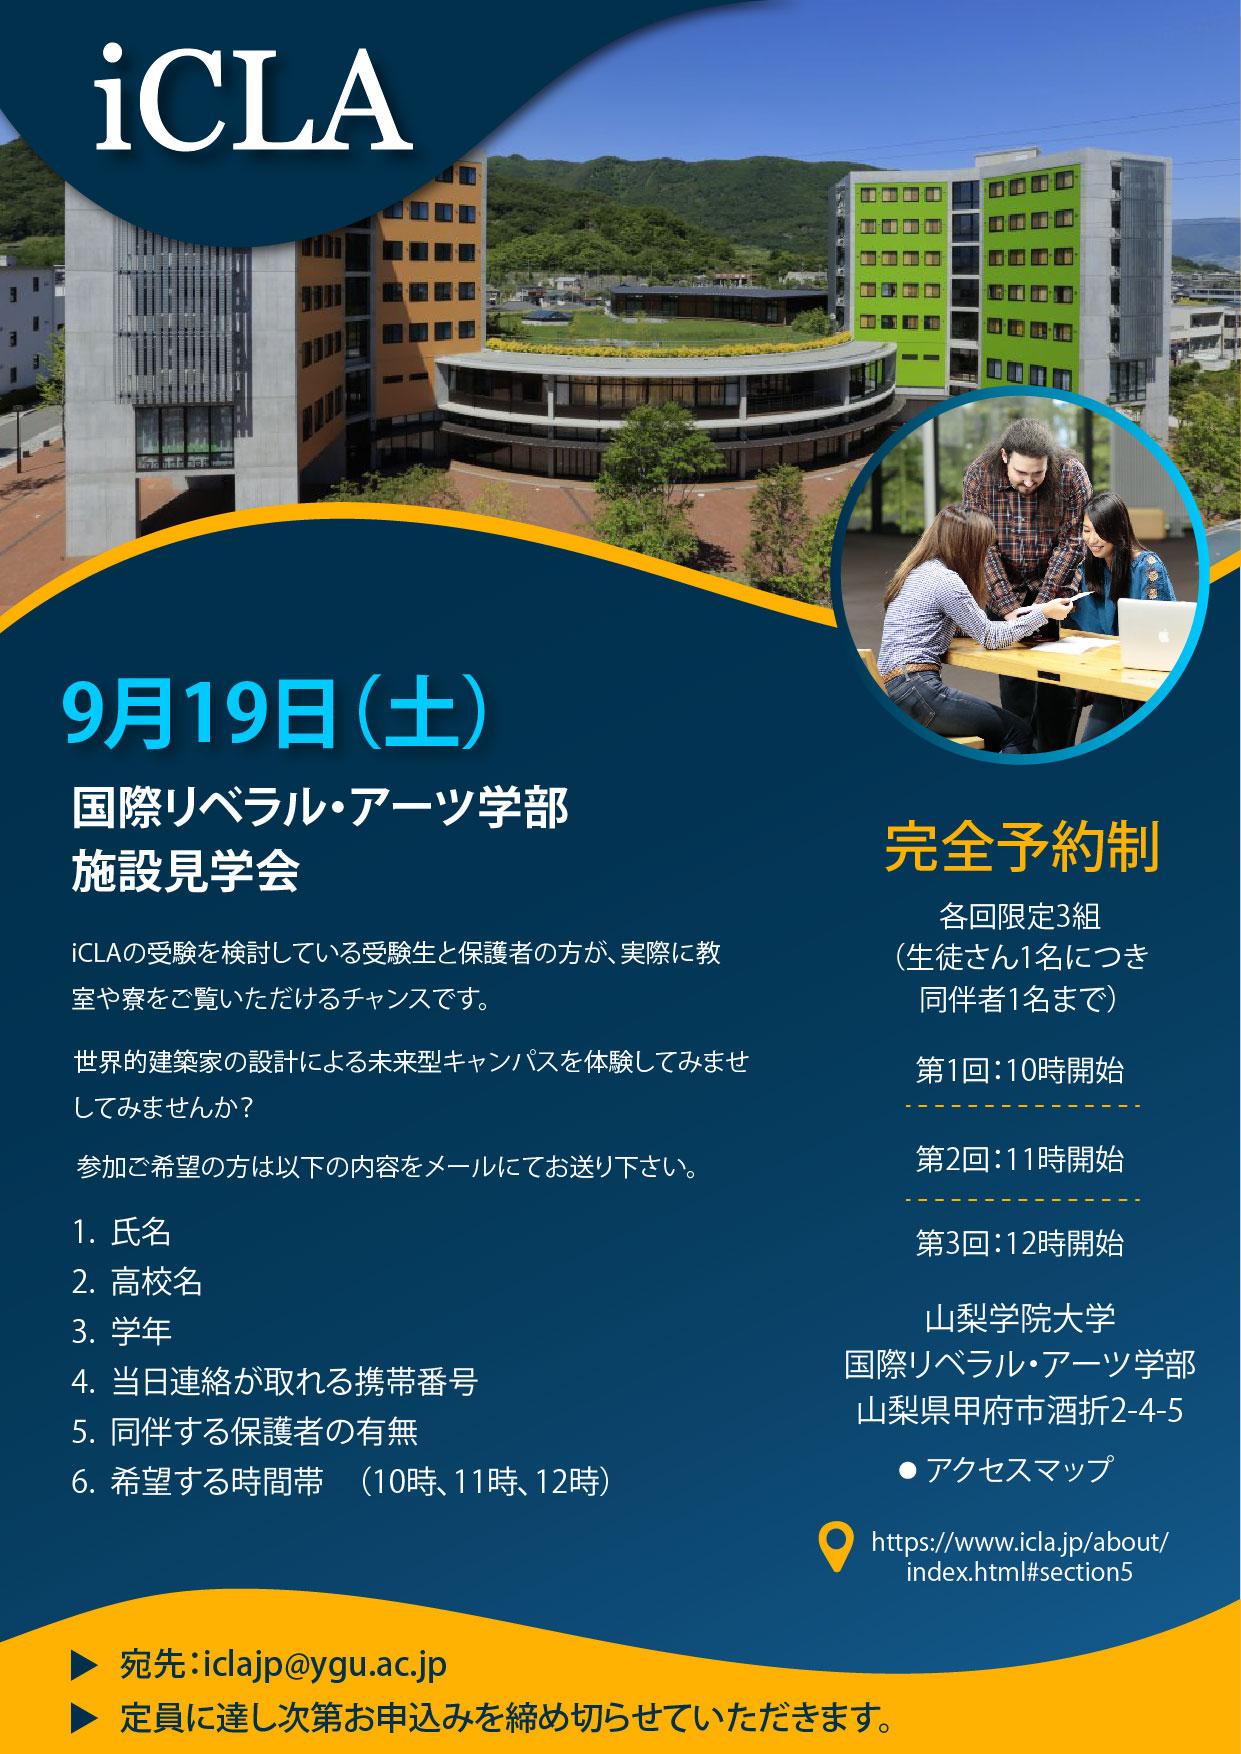 iCLA施設見学会 Sept19 20202.JPG